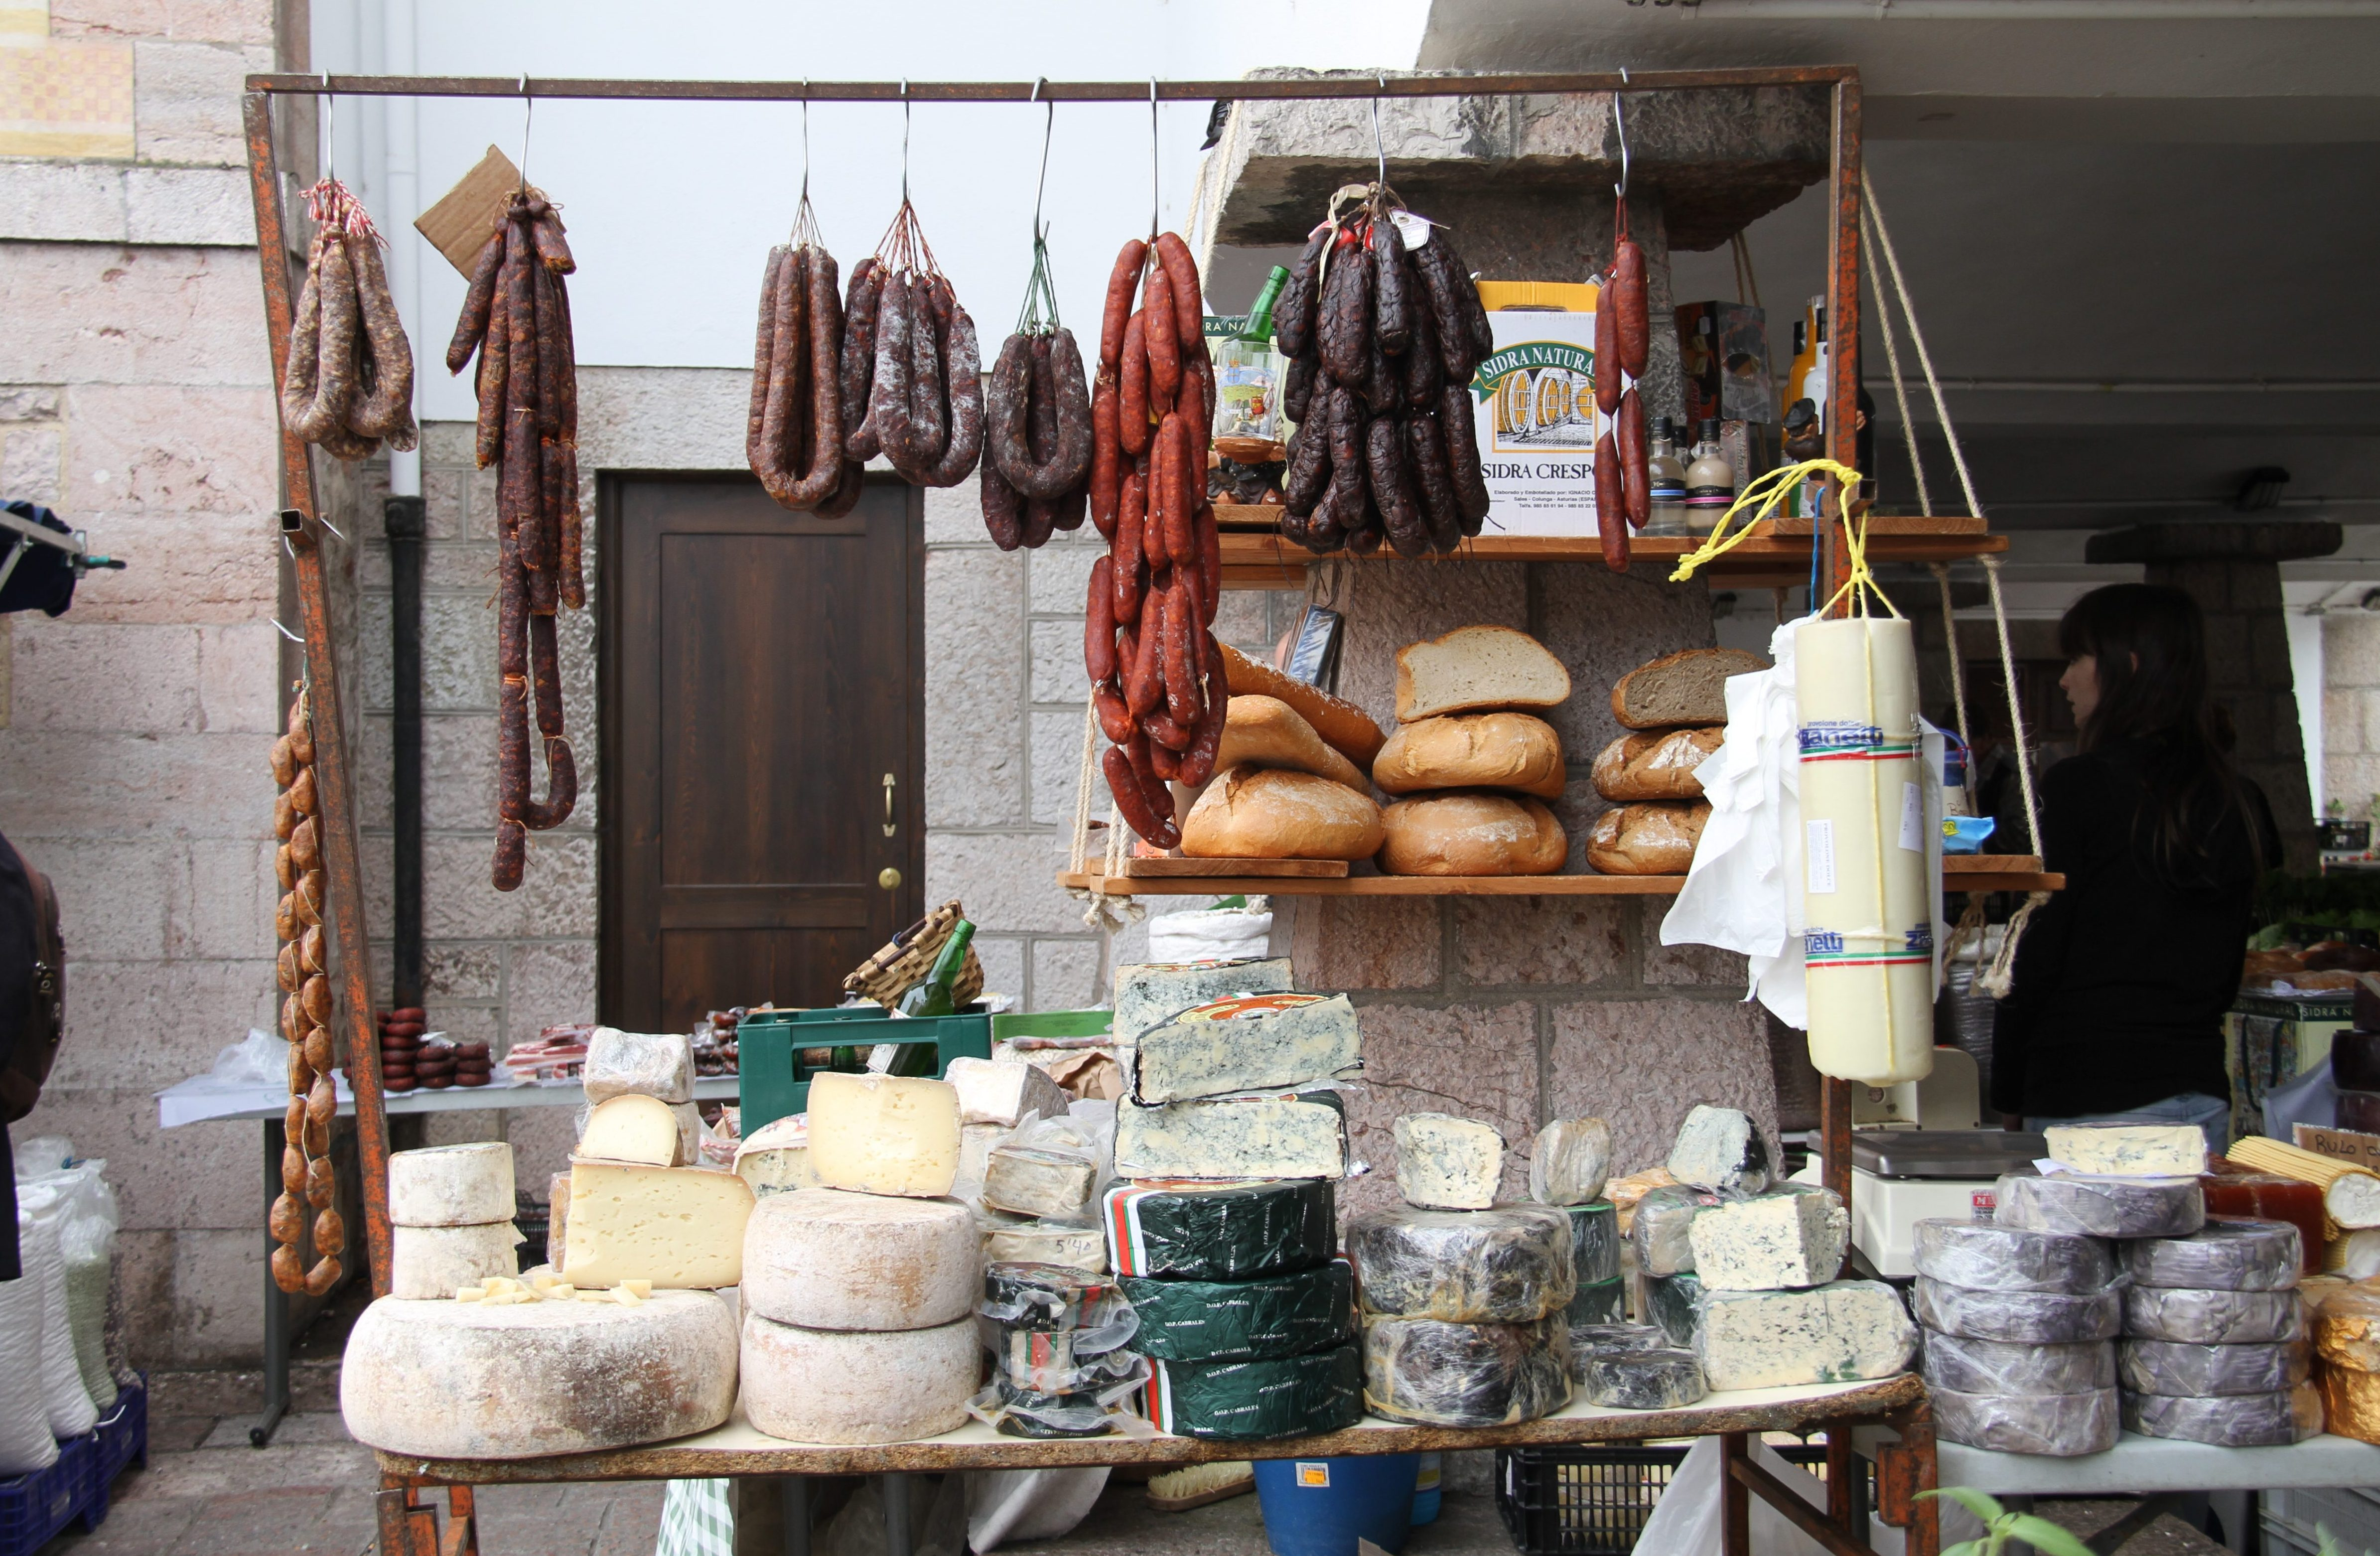 1. Playa de Vega, near Ribadesella. 2. Asturian dairy dominance on display at the Cangas de Onís cheese market. Photos by Matt Goulding.